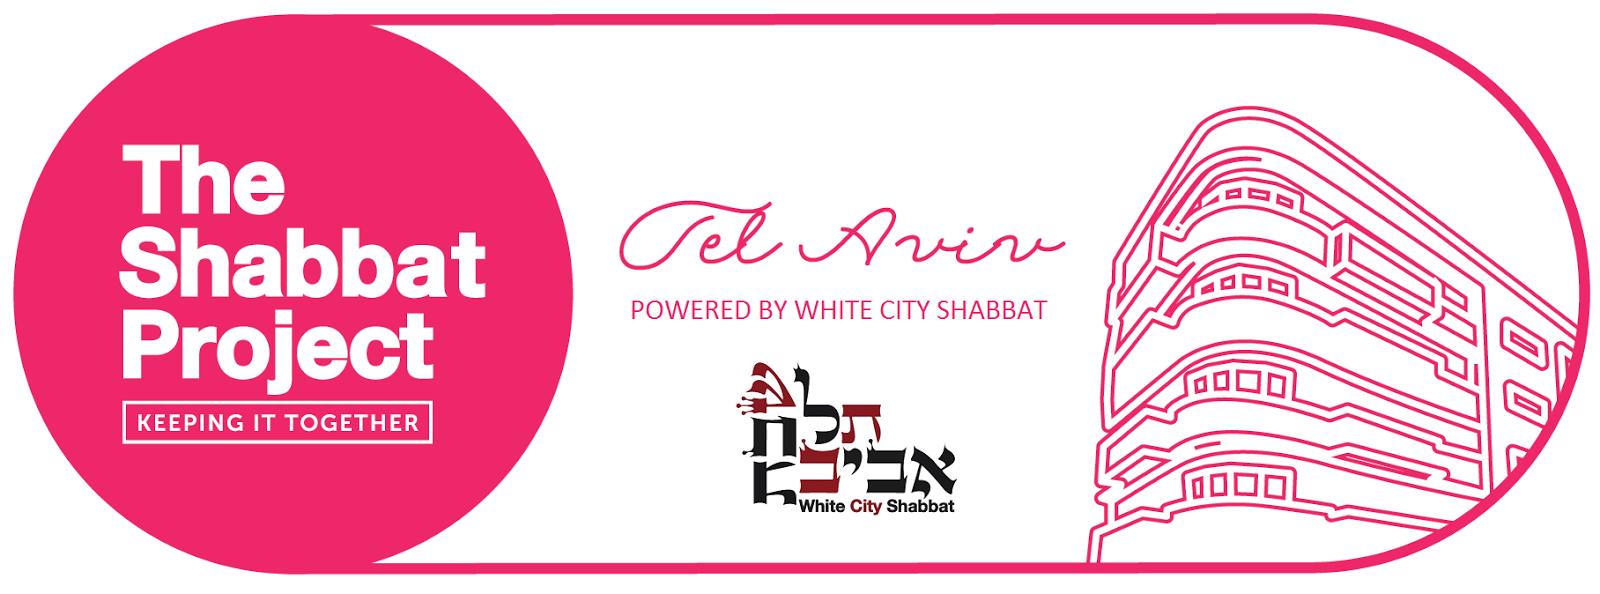 Tel Aviv Shabbos Project WCS.png